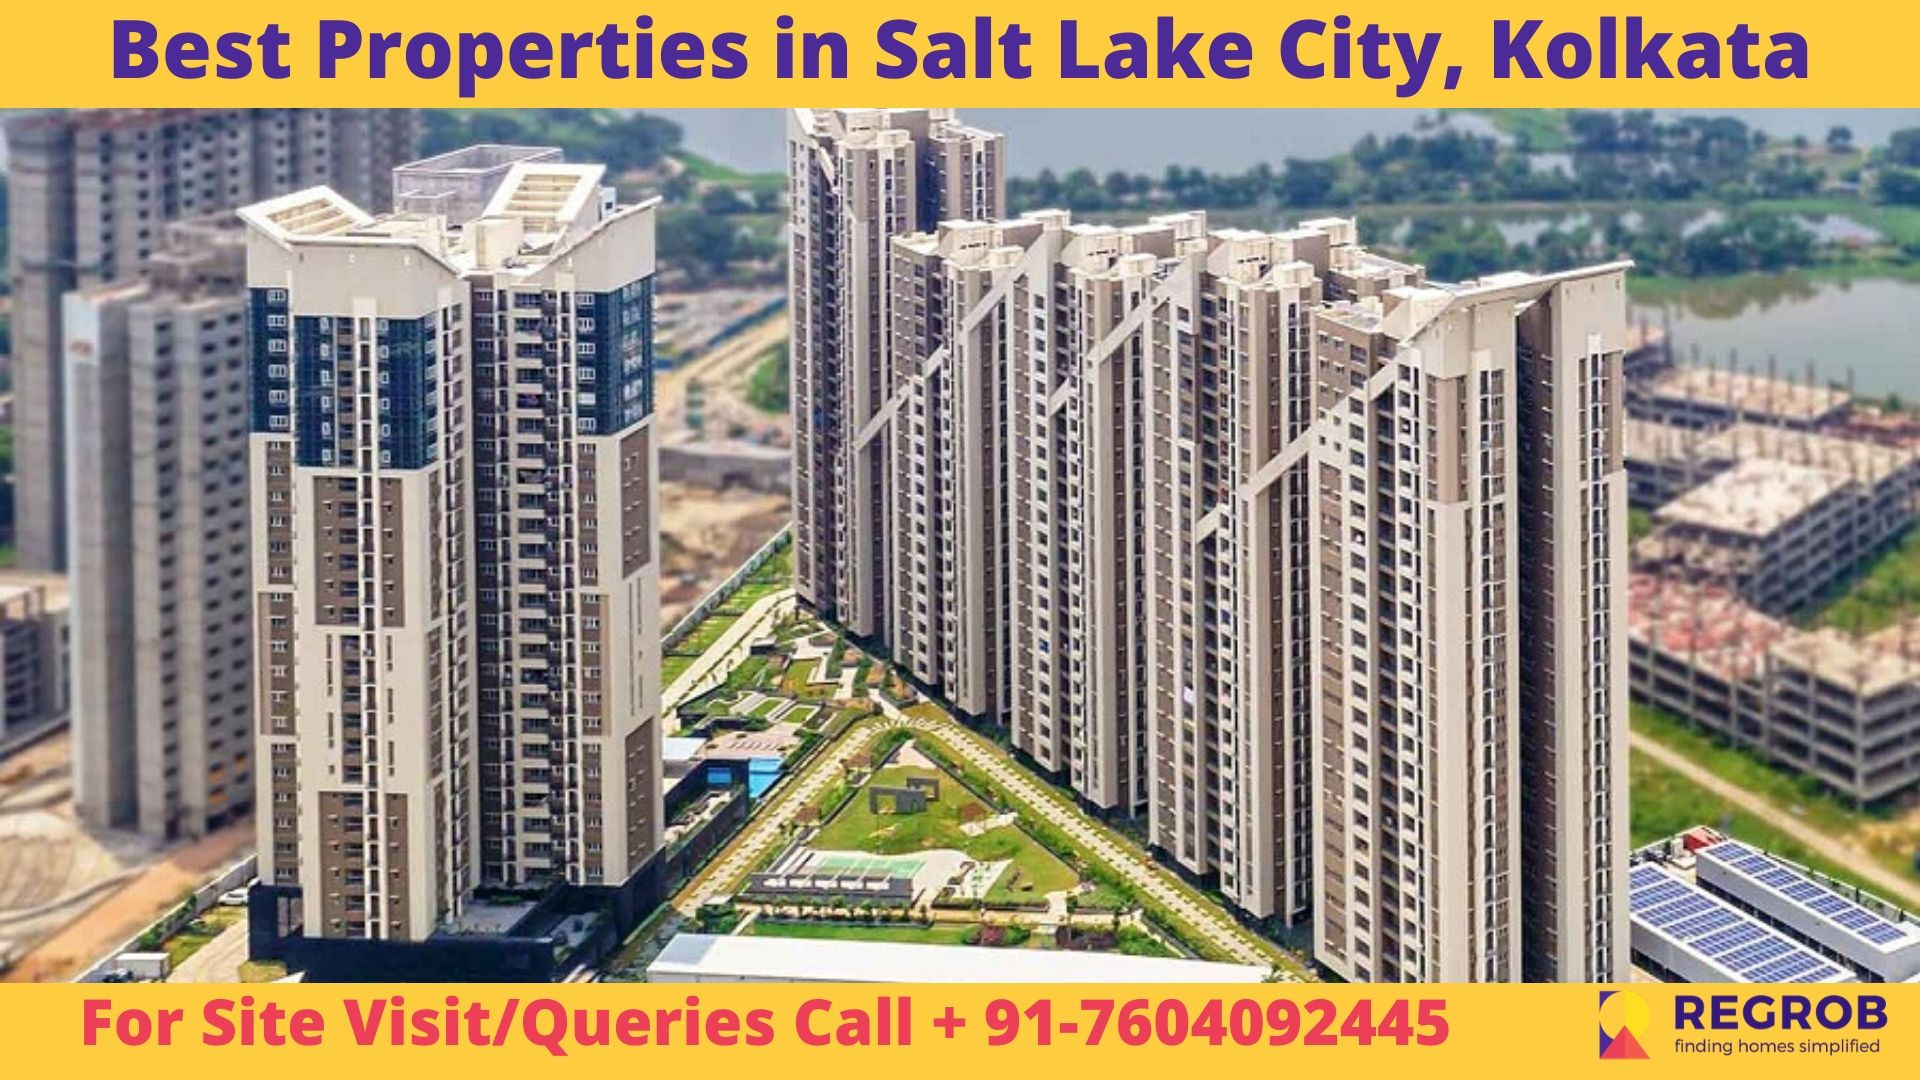 Best Properties in Salt Lake City, Kolkata